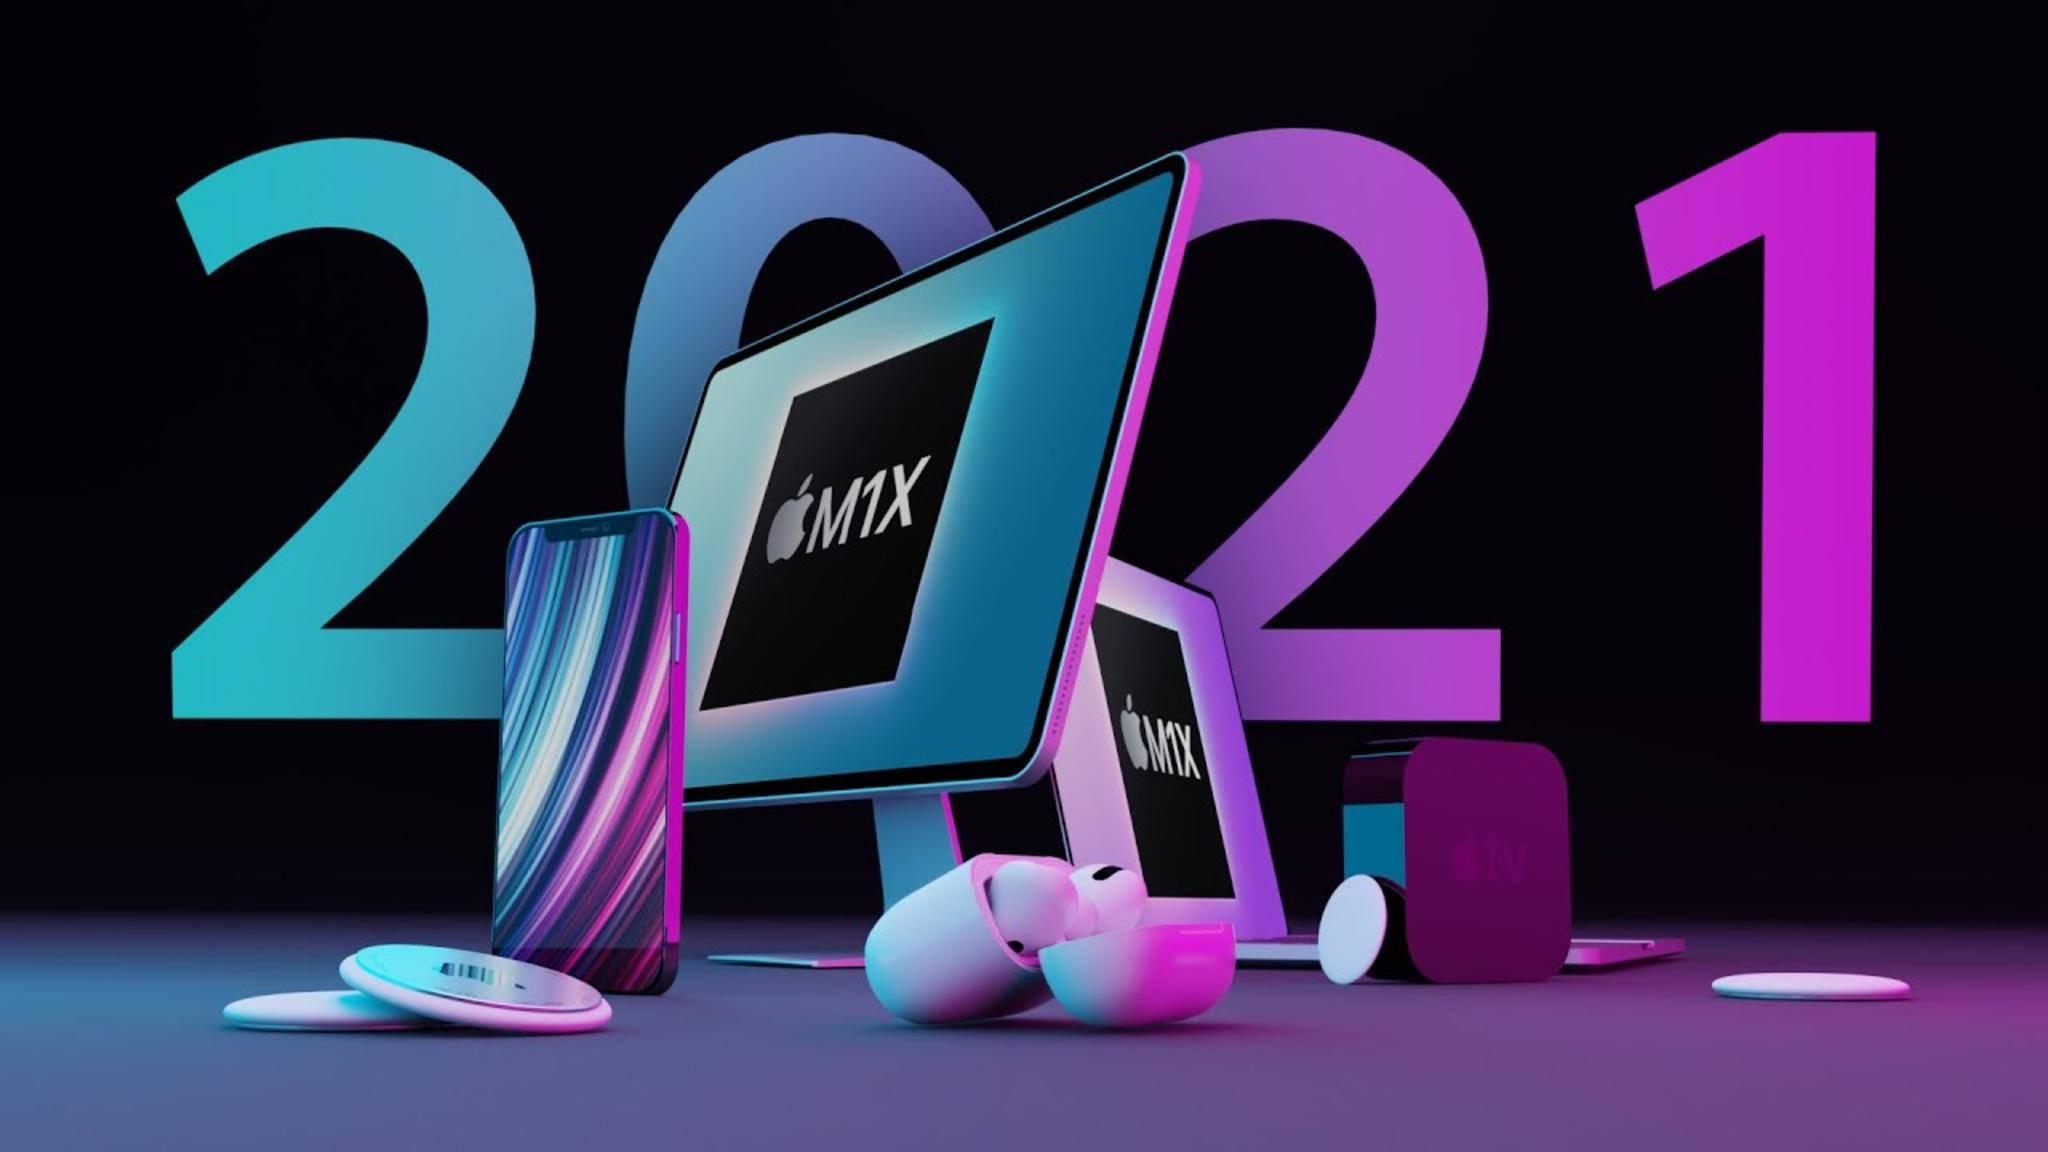 Der erste Apple-Event des Jahres findet am 20. April statt.